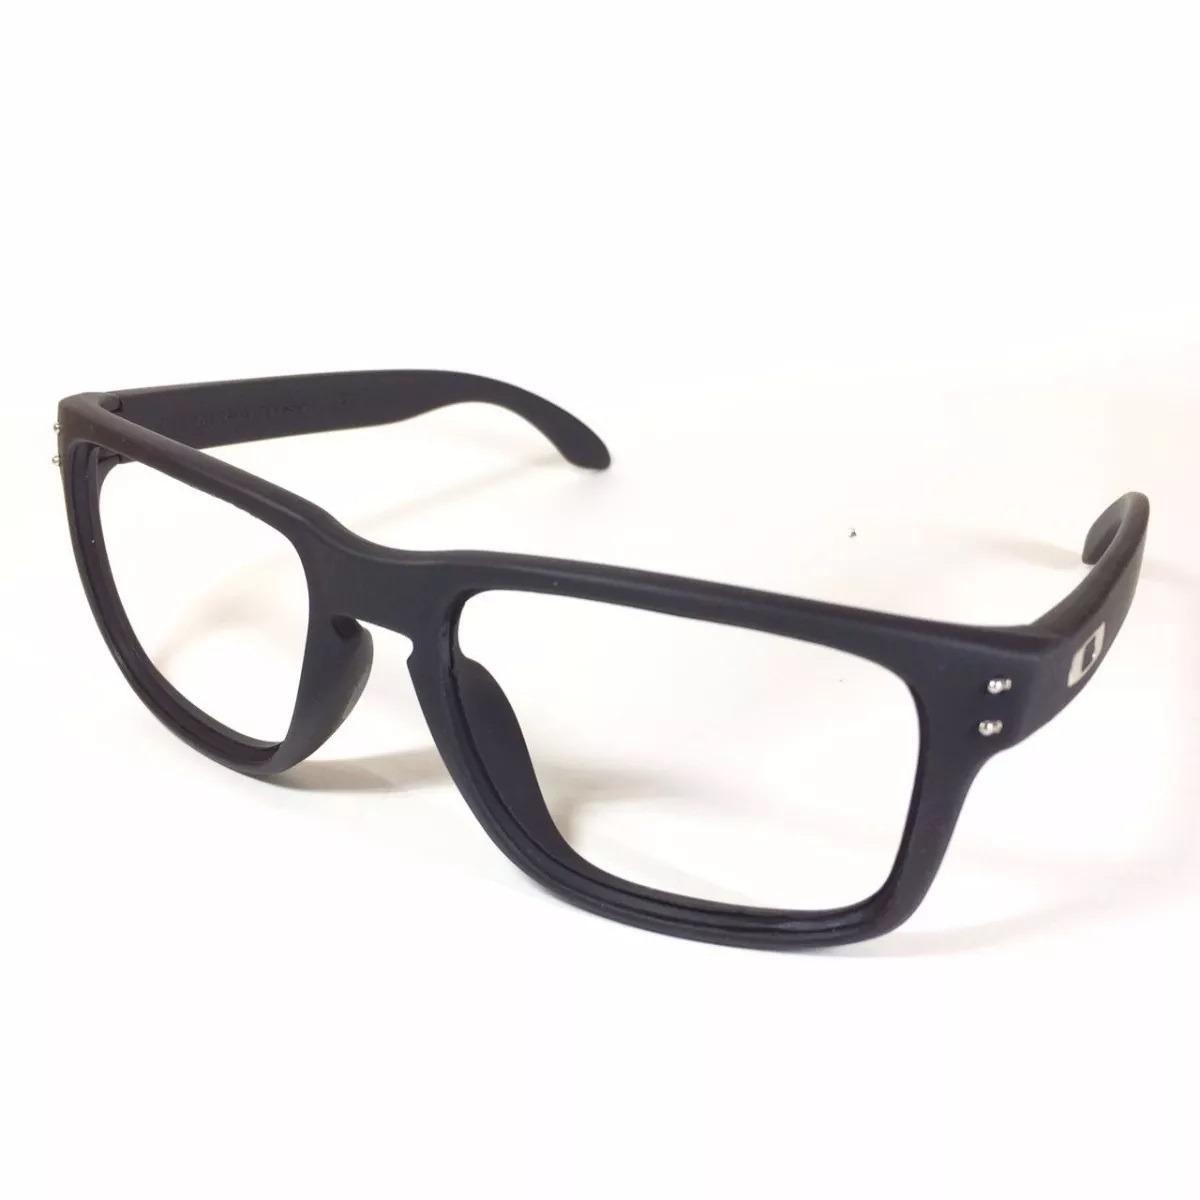 oculos oakley holbrook lente espelhada 65eefbda14